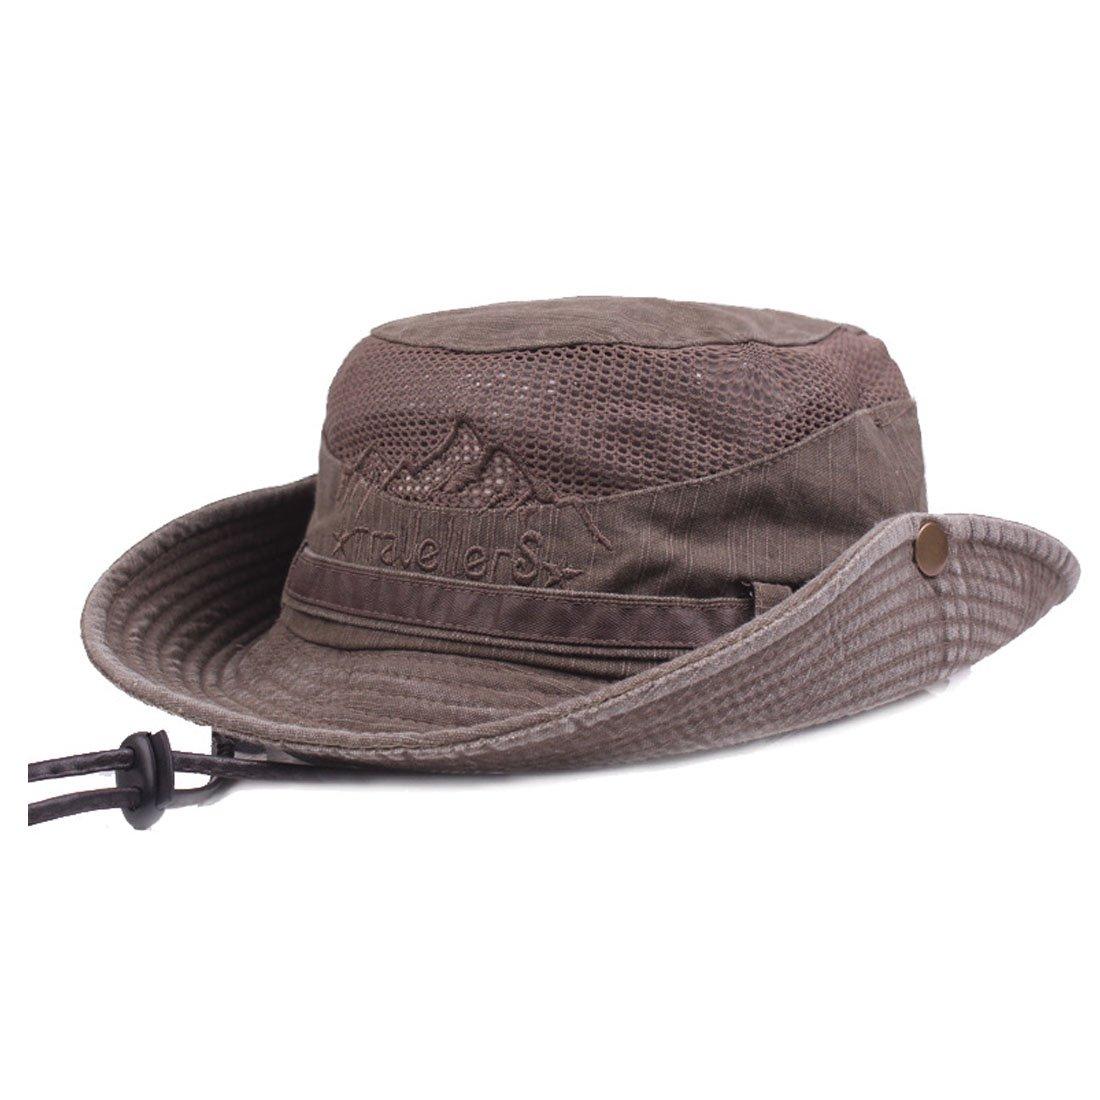 King Star Men Summer Cotton Cowboy Sun Hat Wide Brim Bucket Fishing Hats Coffee